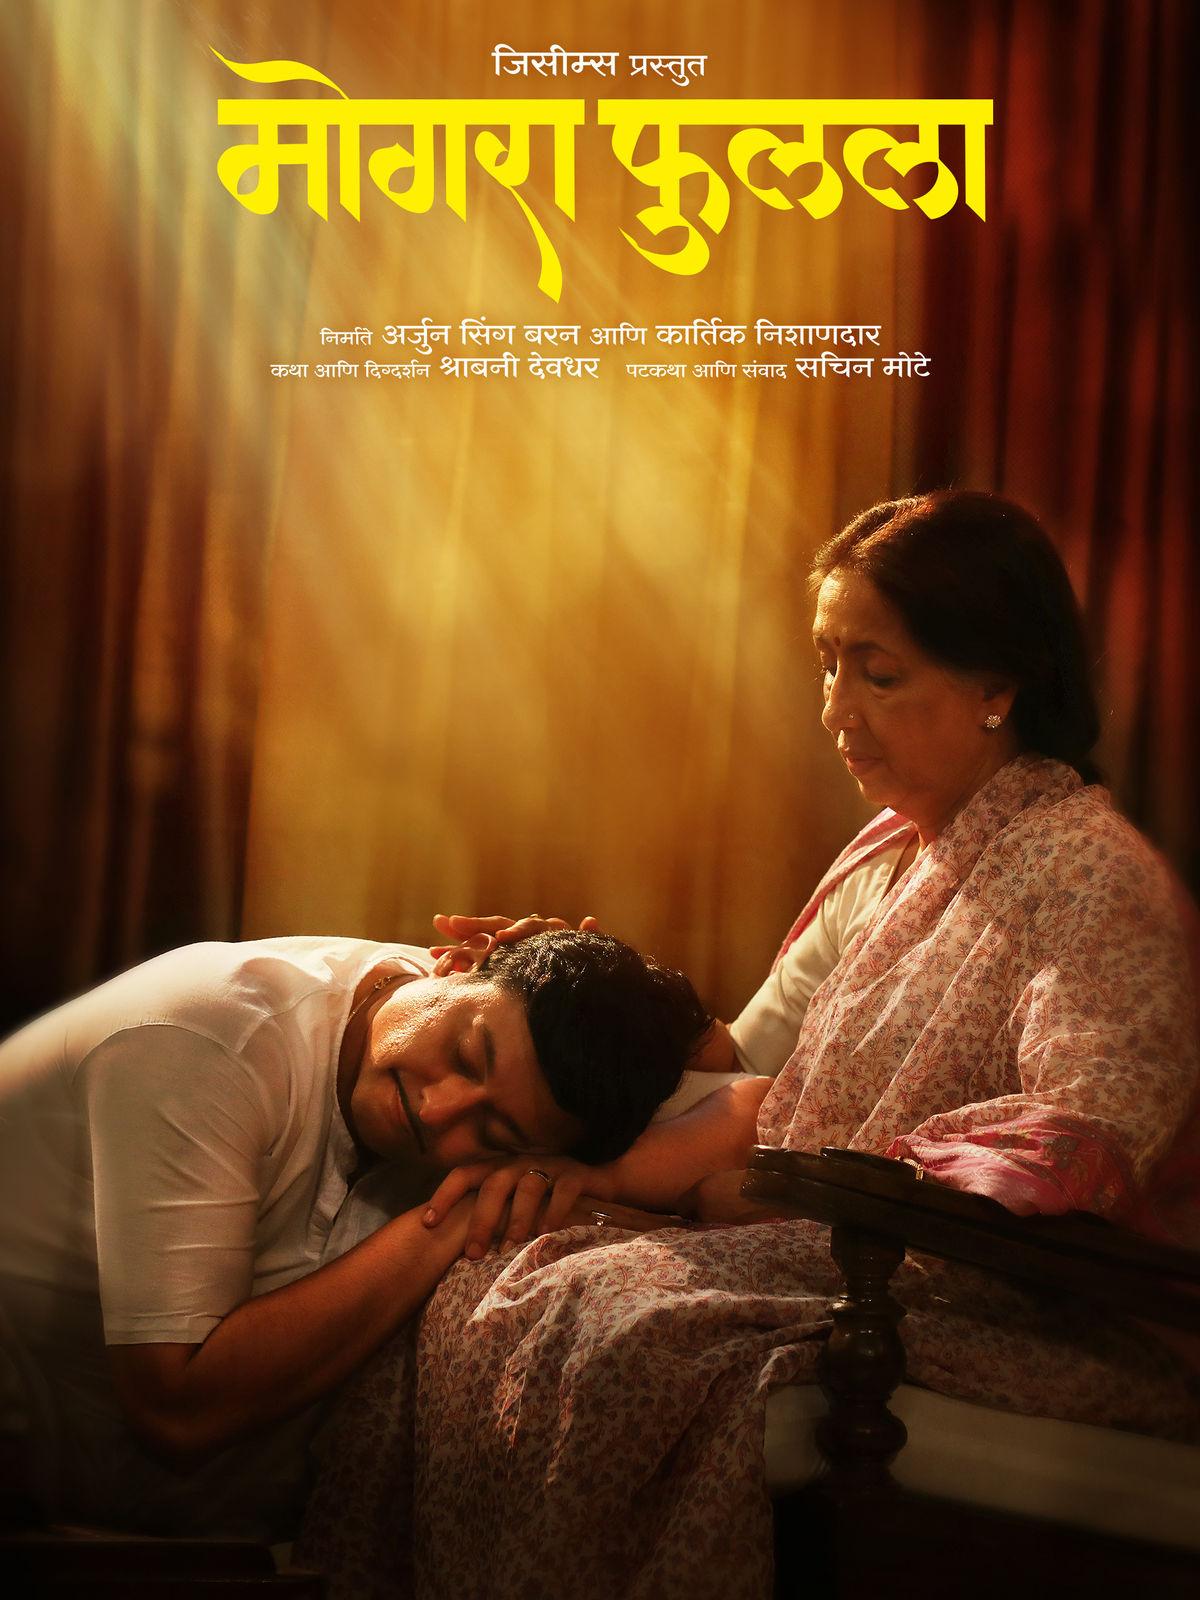 Madhuri Bharti Best Movies, TV Shows and Web Series List